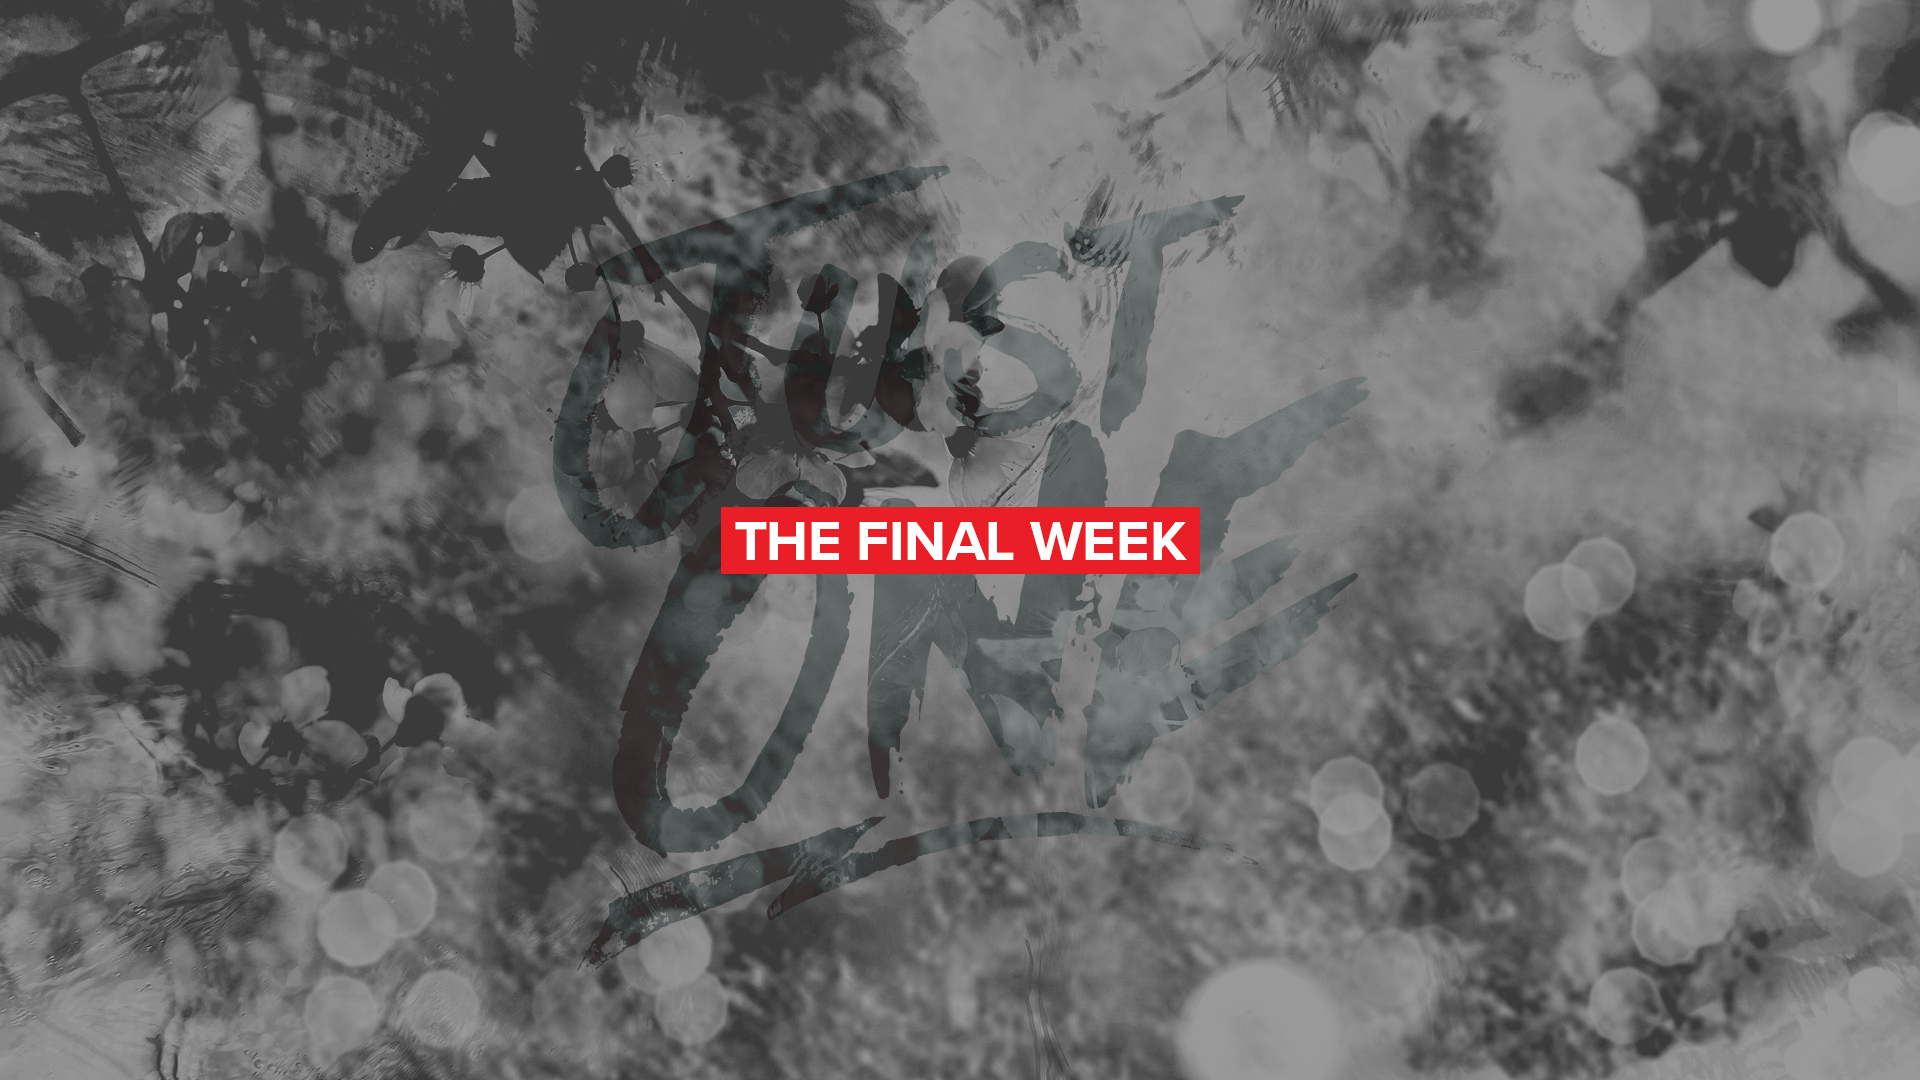 The Final Week (2018)